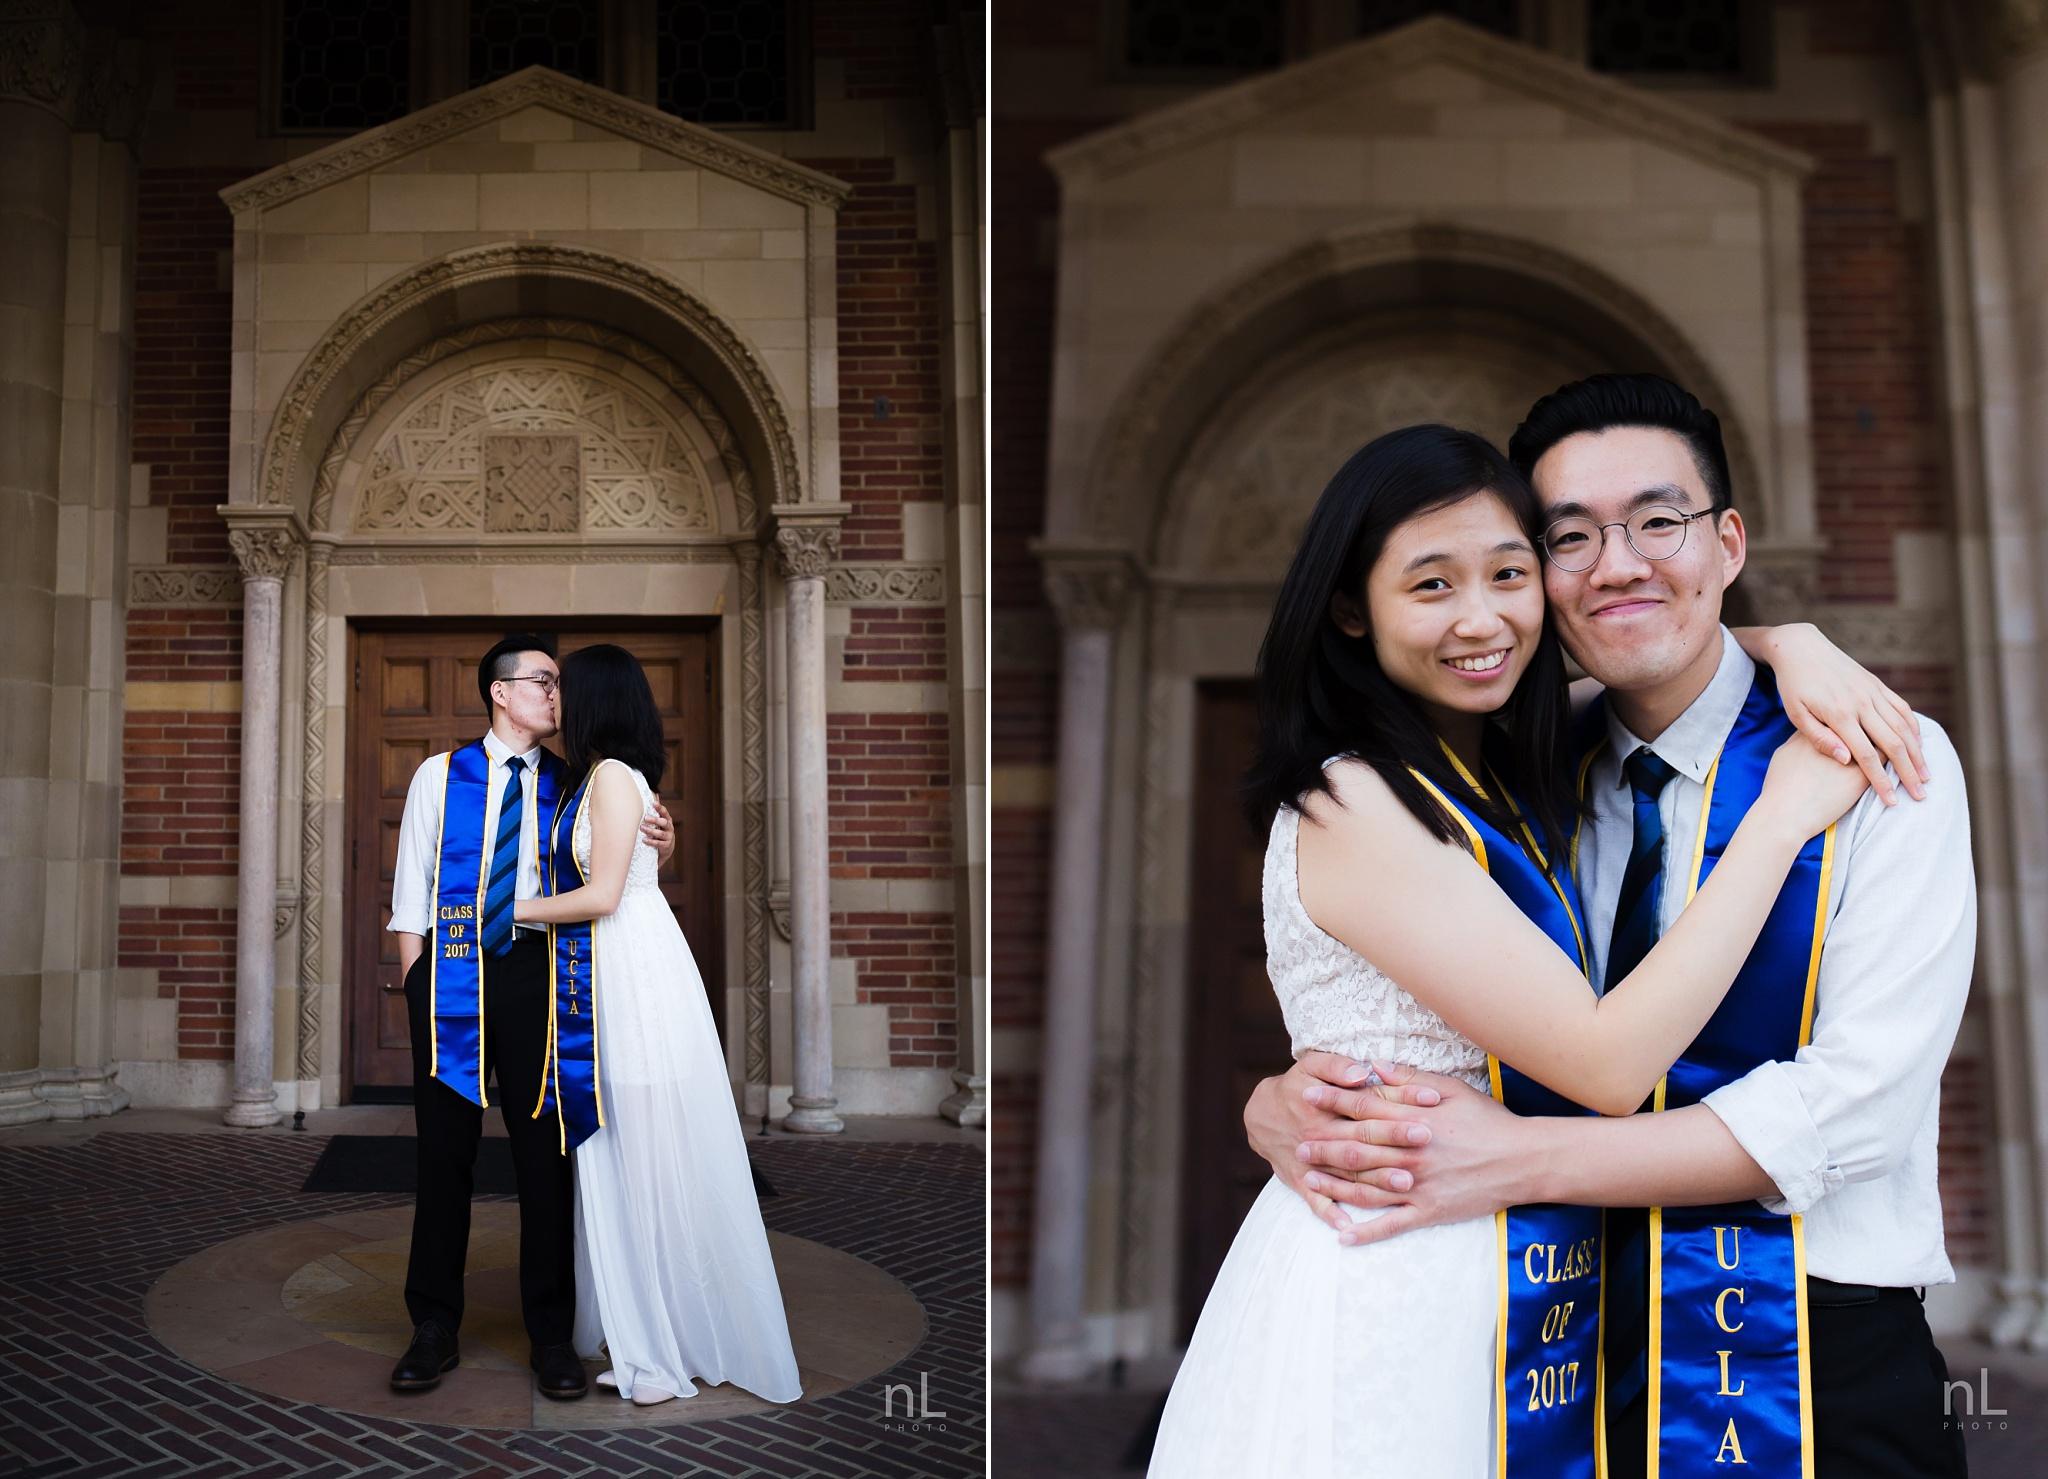 los angeles ucla senior graduation portrait cute couple hugging at royce hall